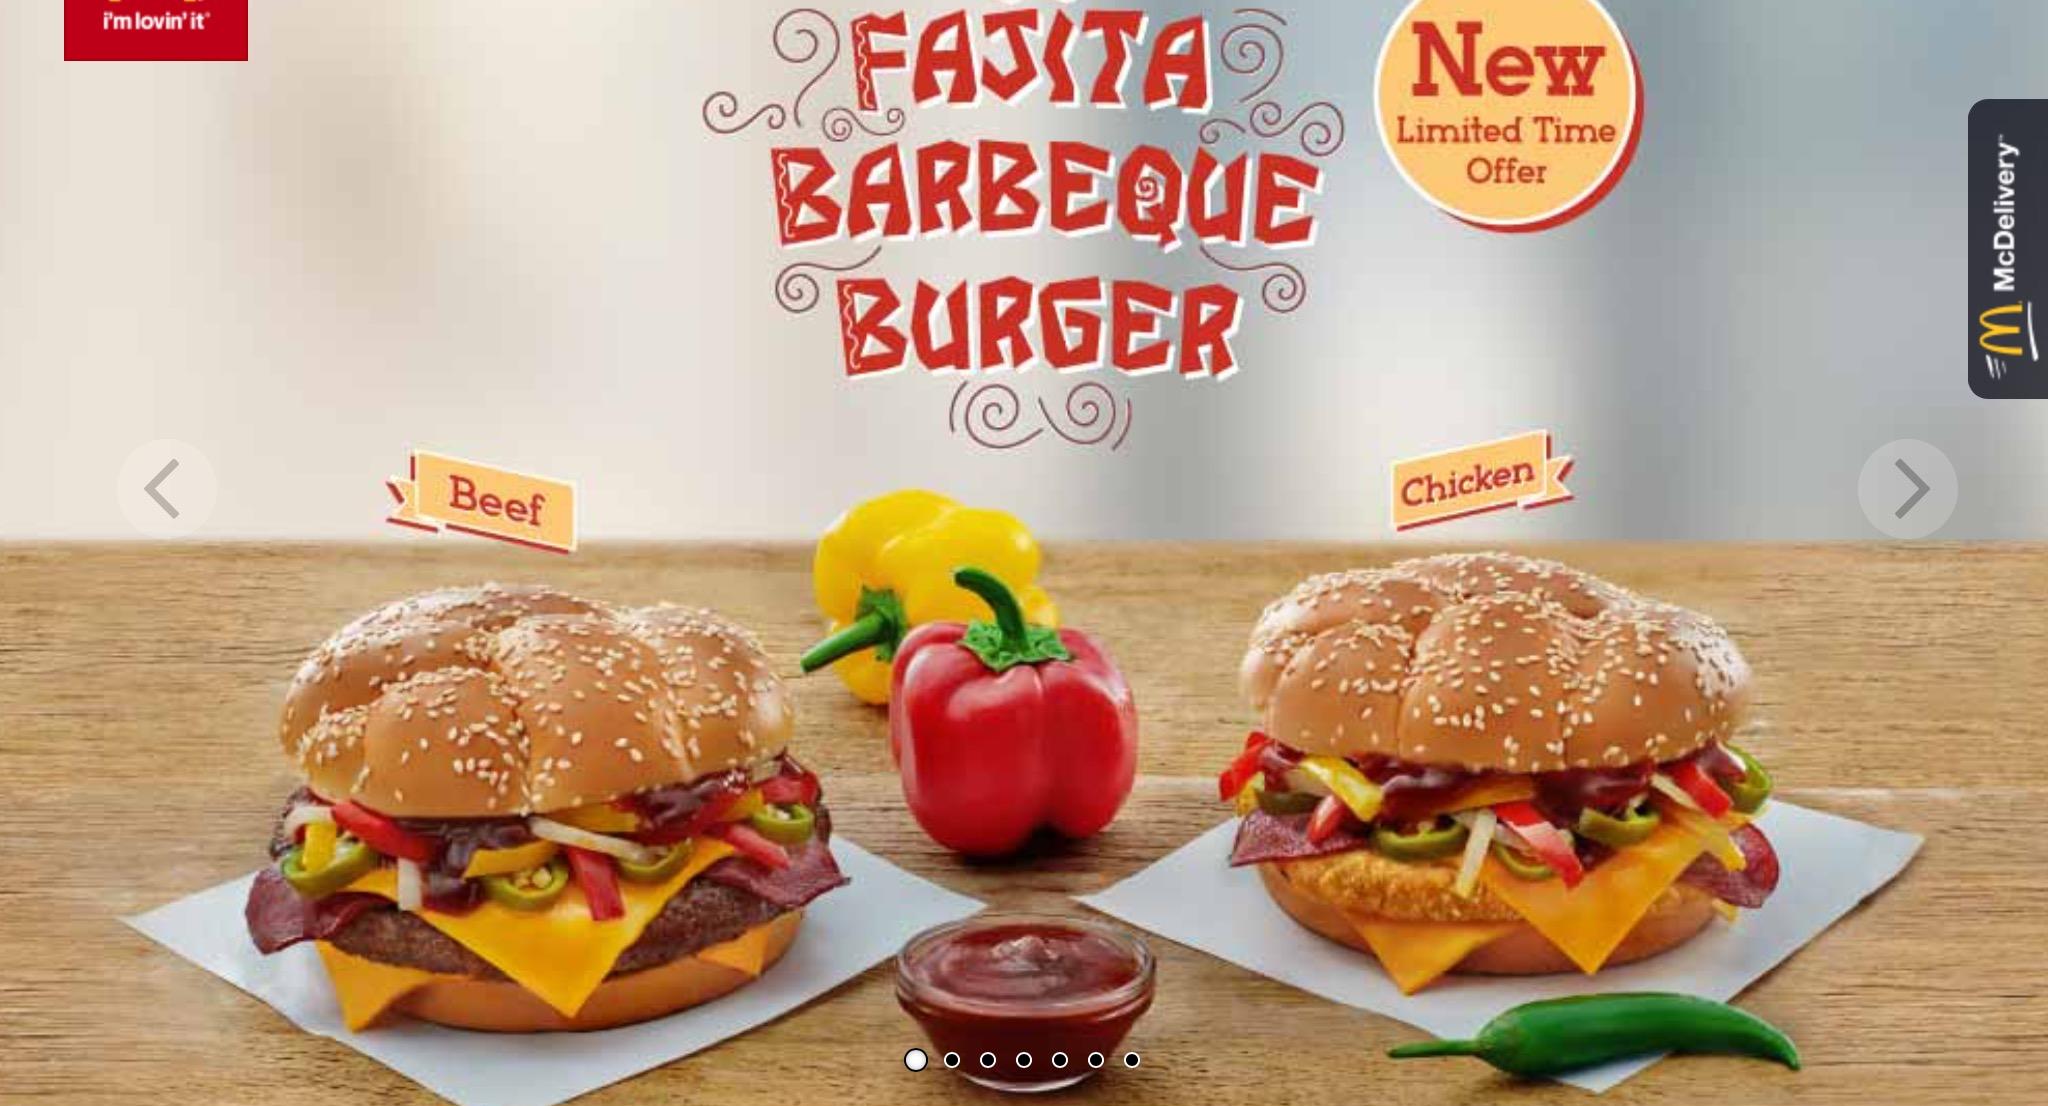 McDonald's Egypt - Fajita Barbecue Burger